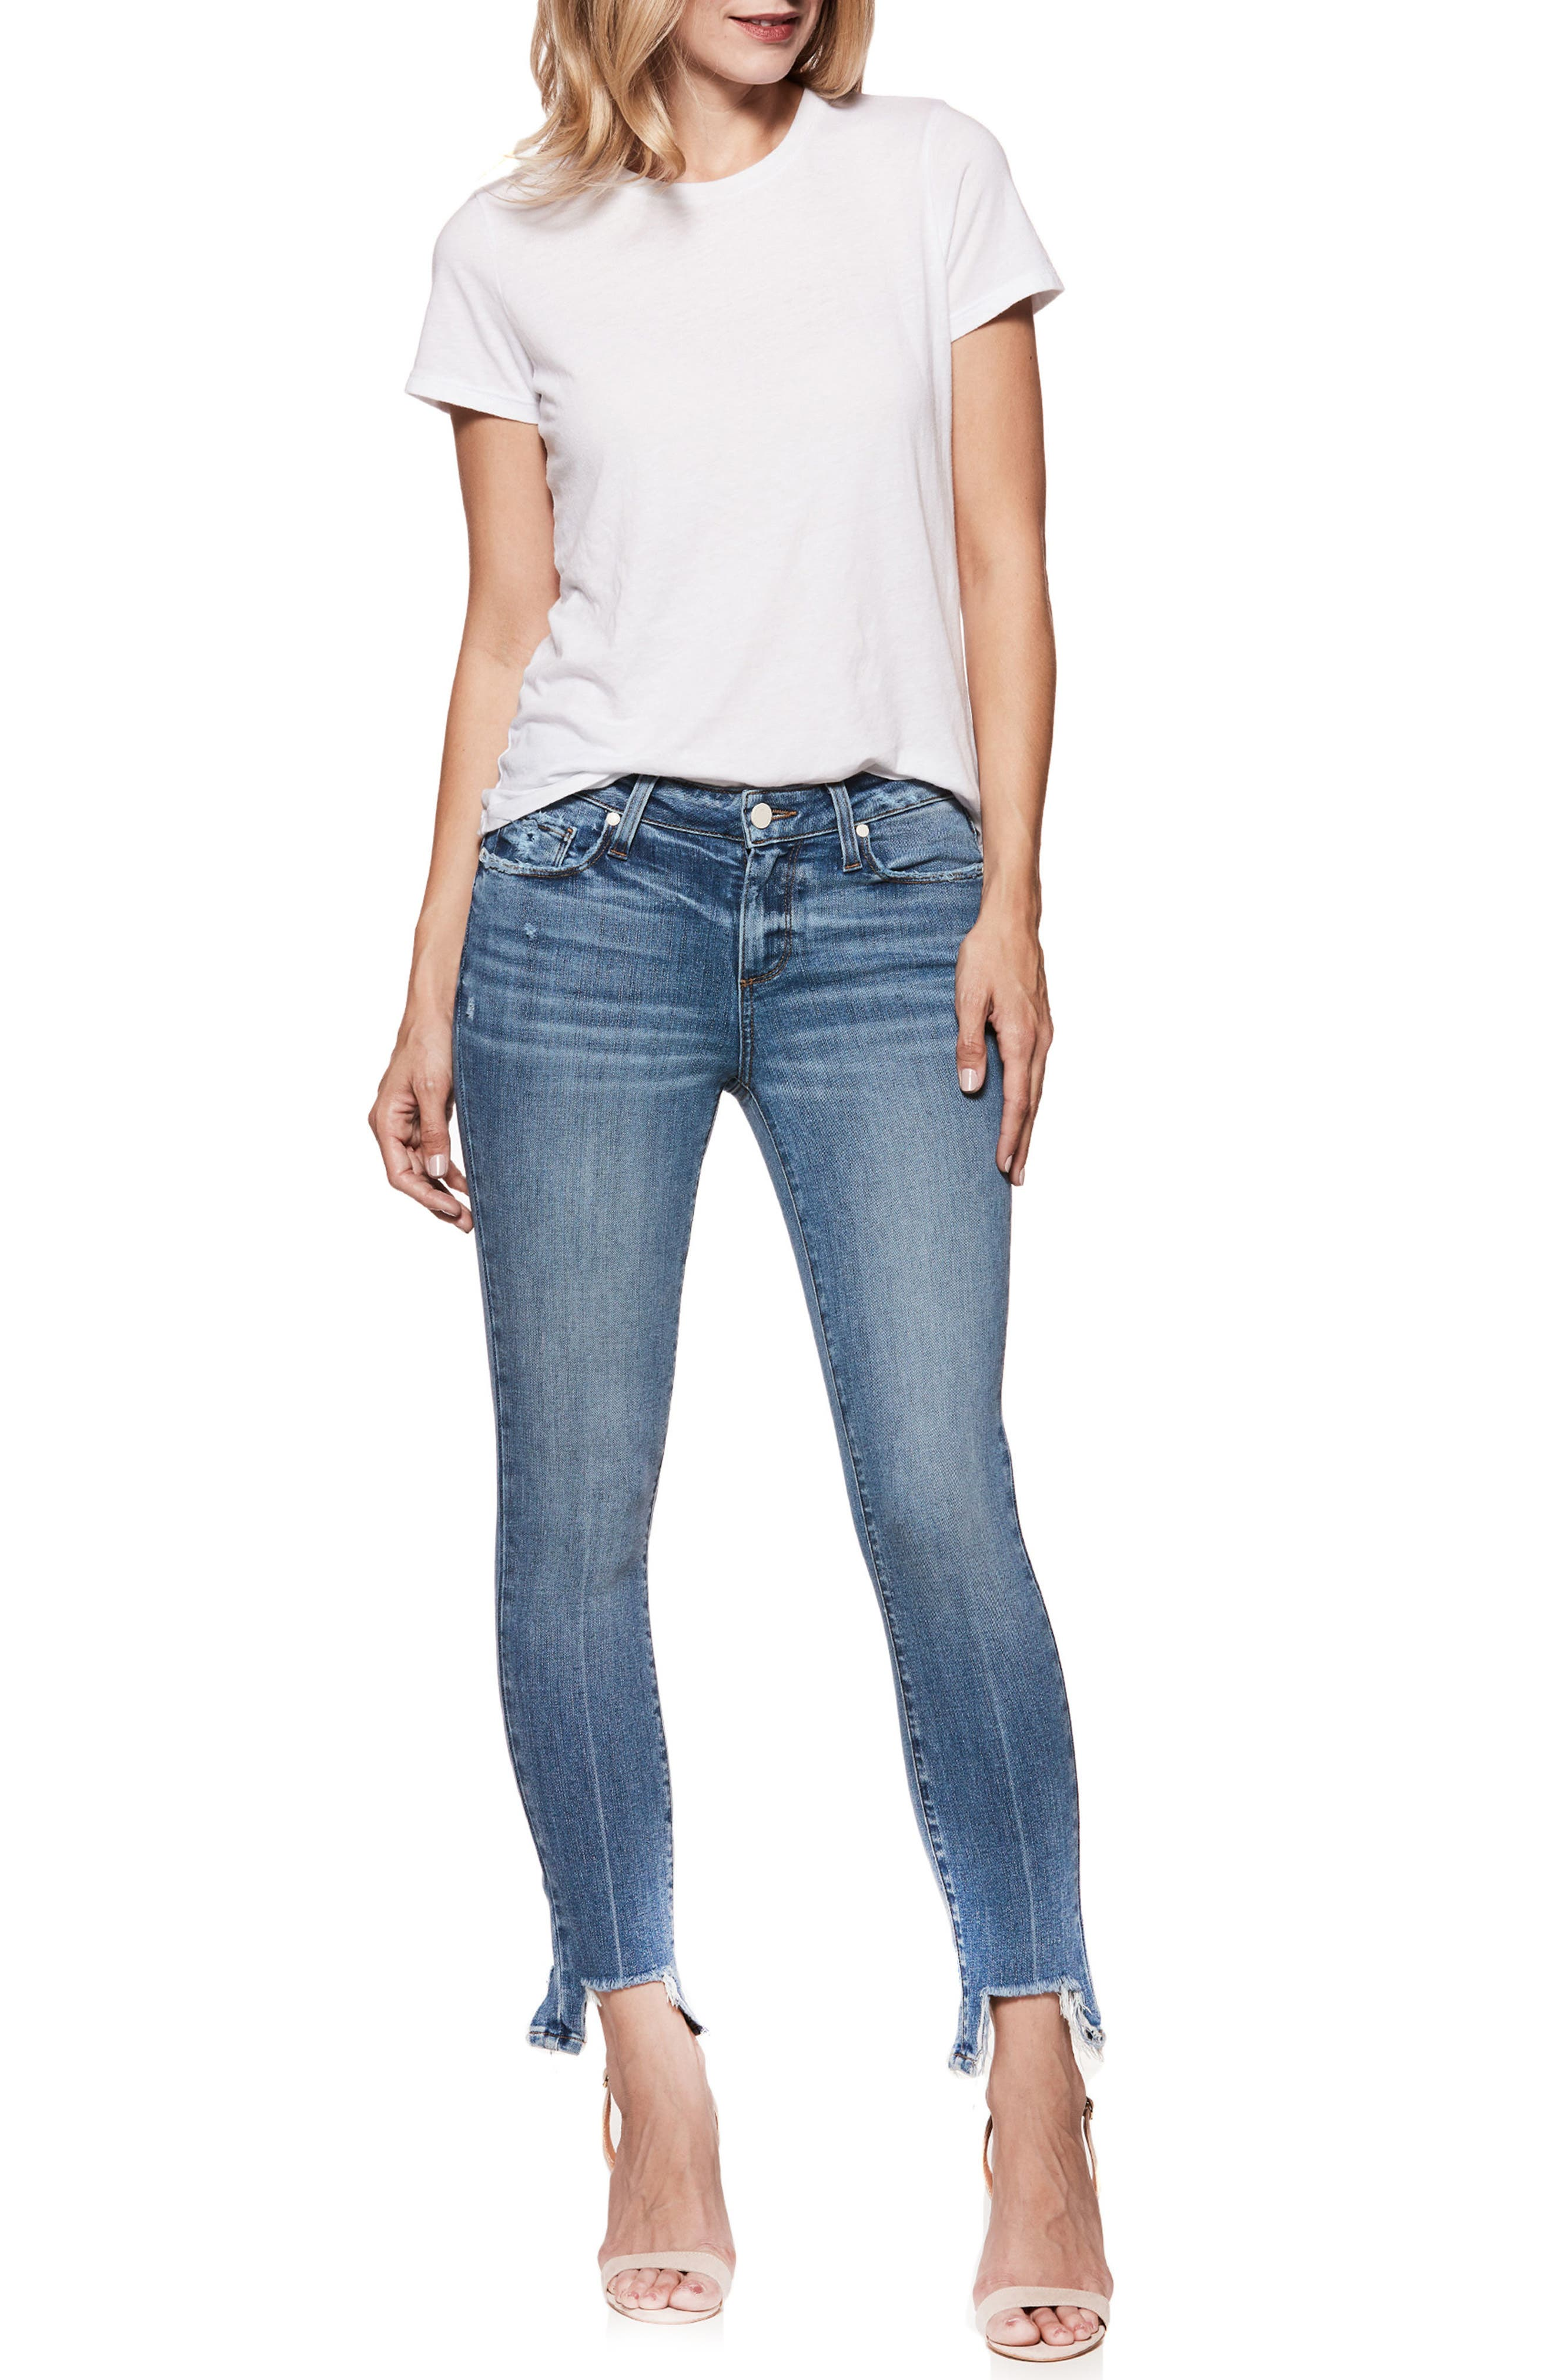 Transcend Vintage - Hoxton High Waist Ankle Skinny Jeans,                             Alternate thumbnail 8, color,                             400